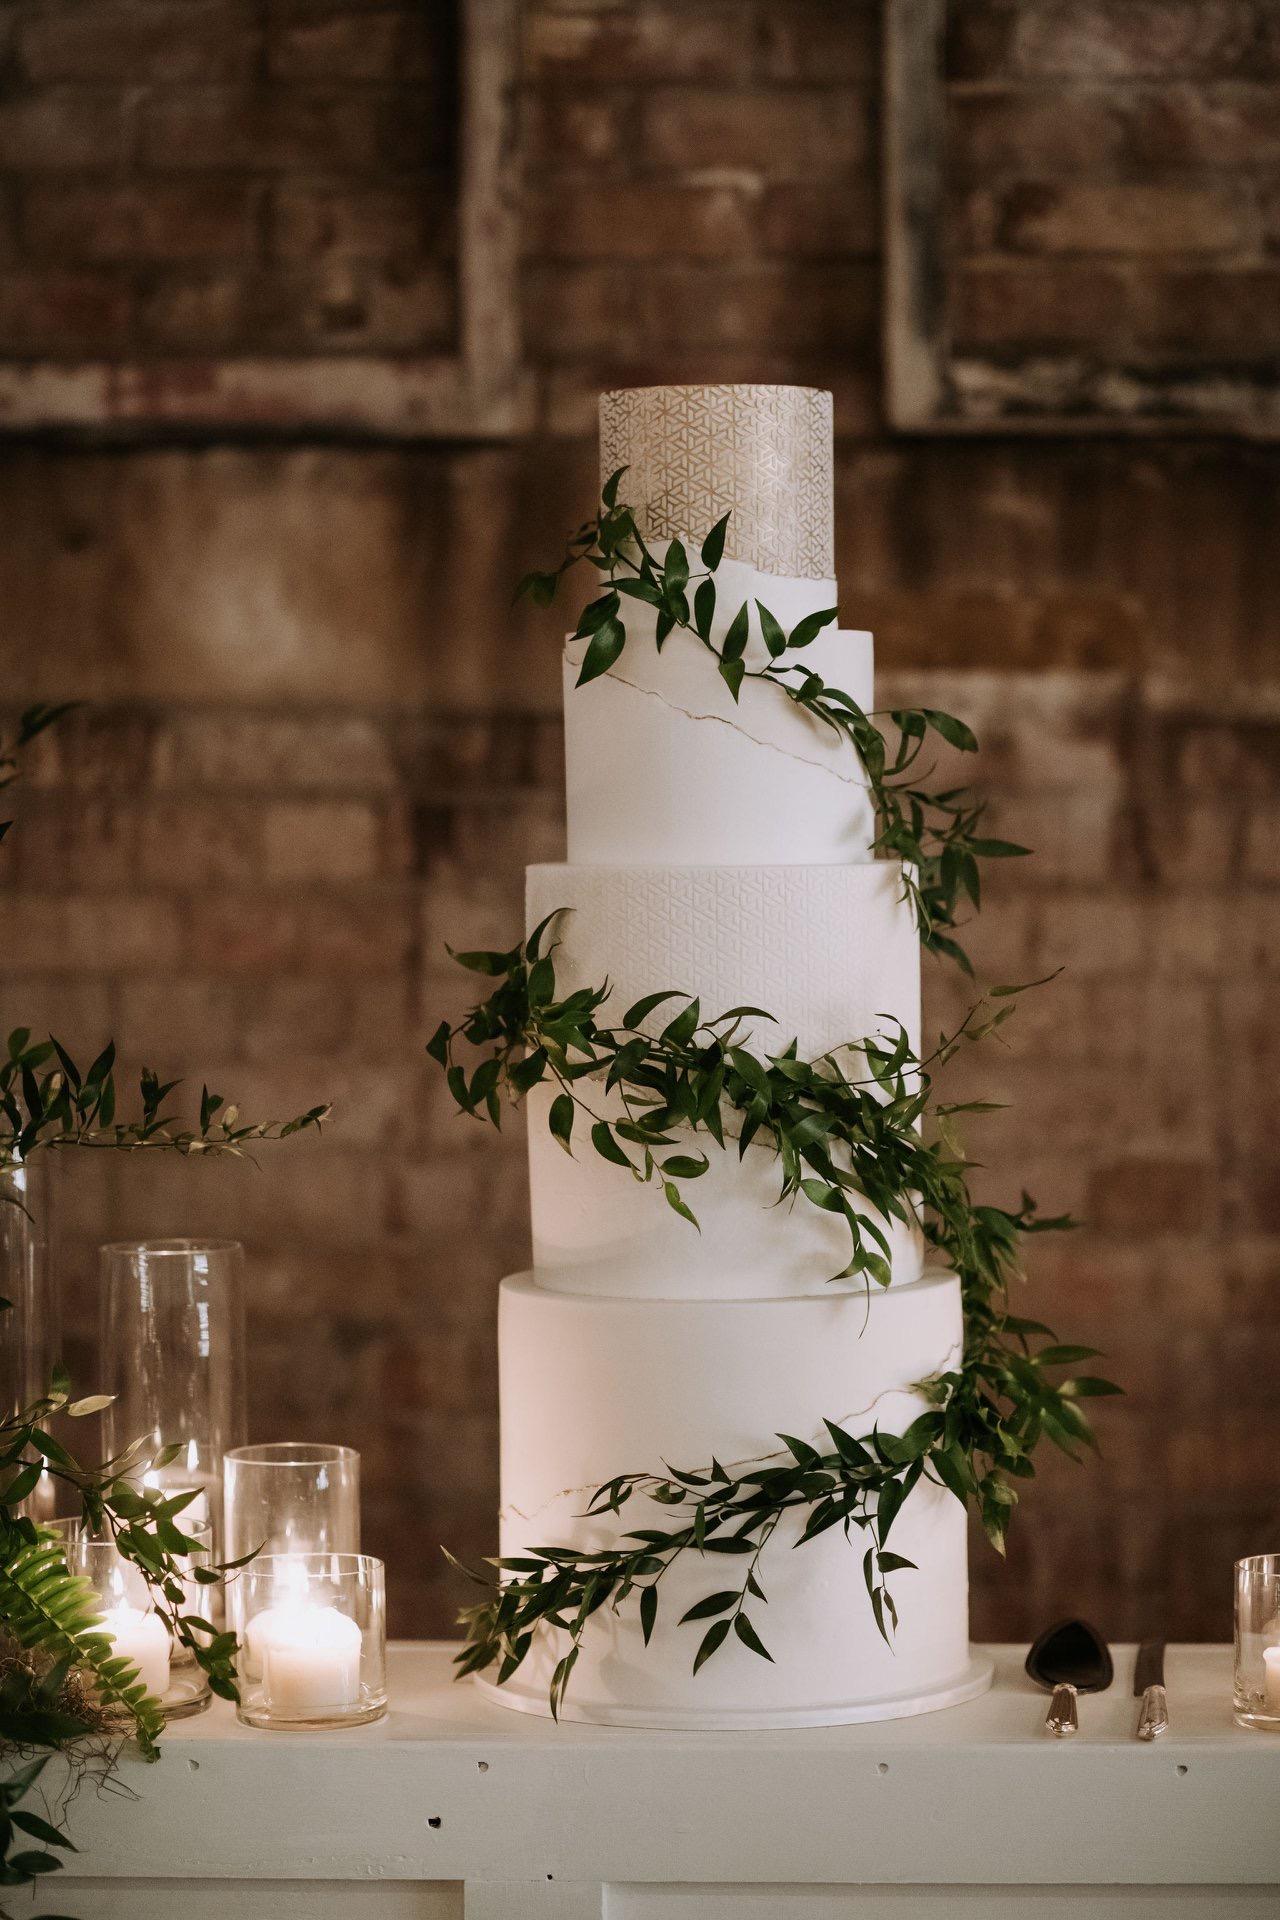 Vanillapod-weddingcakes-brisbaneweddings-buttercream-fondant (5).JPG